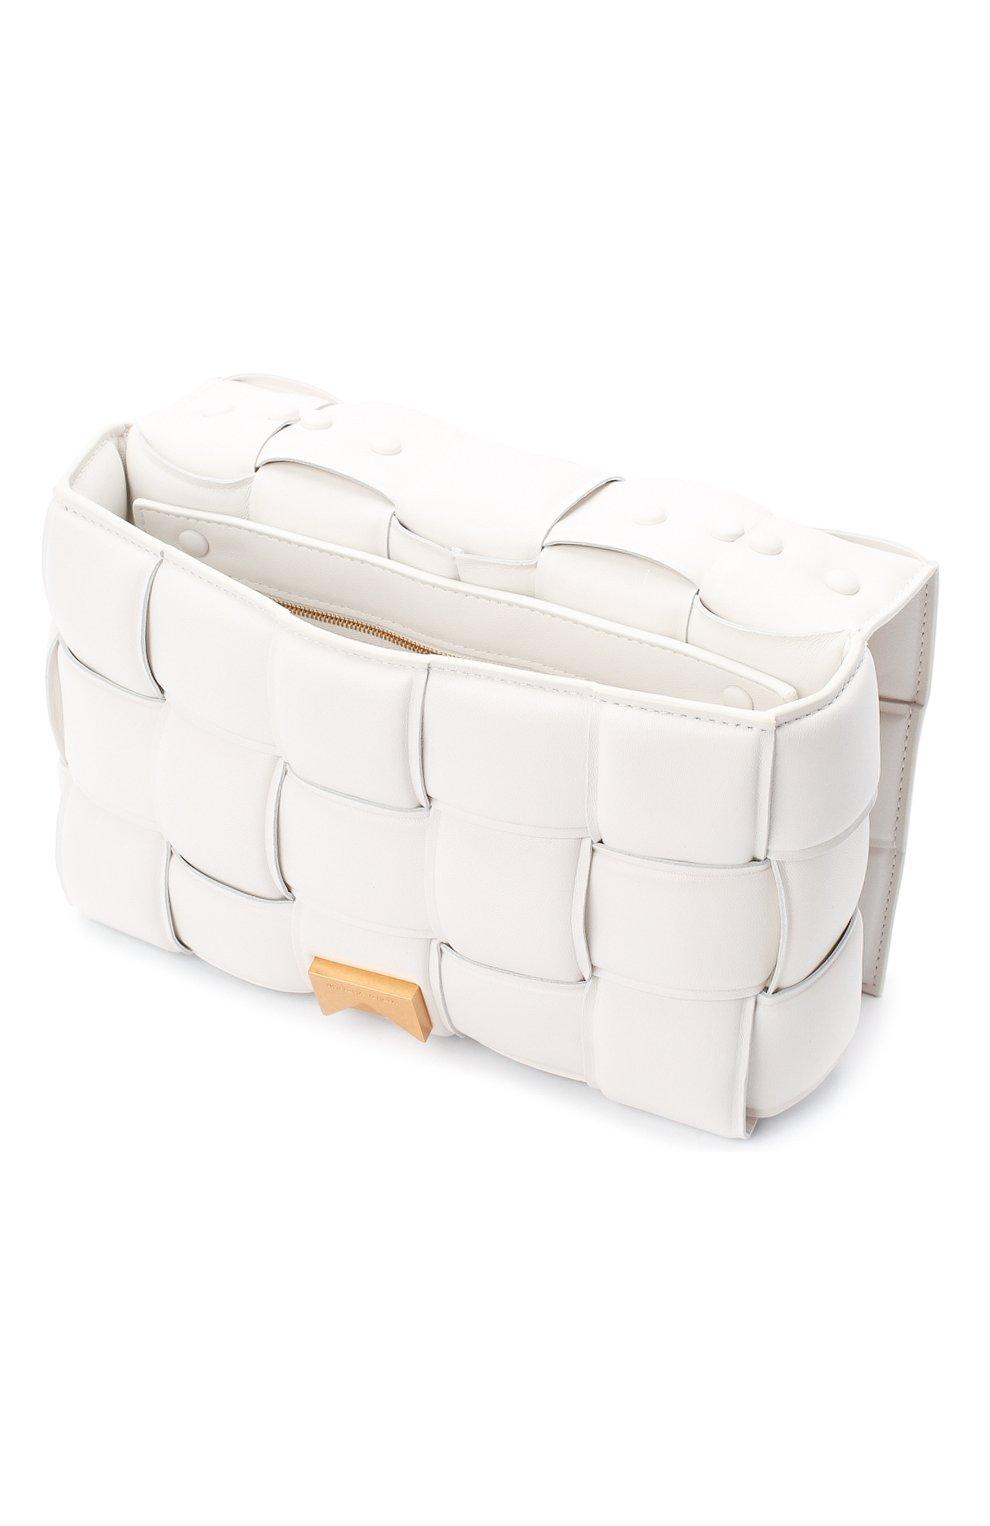 Женская сумка chain cassette BOTTEGA VENETA белого цвета, арт. 631421/VBWZ0 | Фото 4